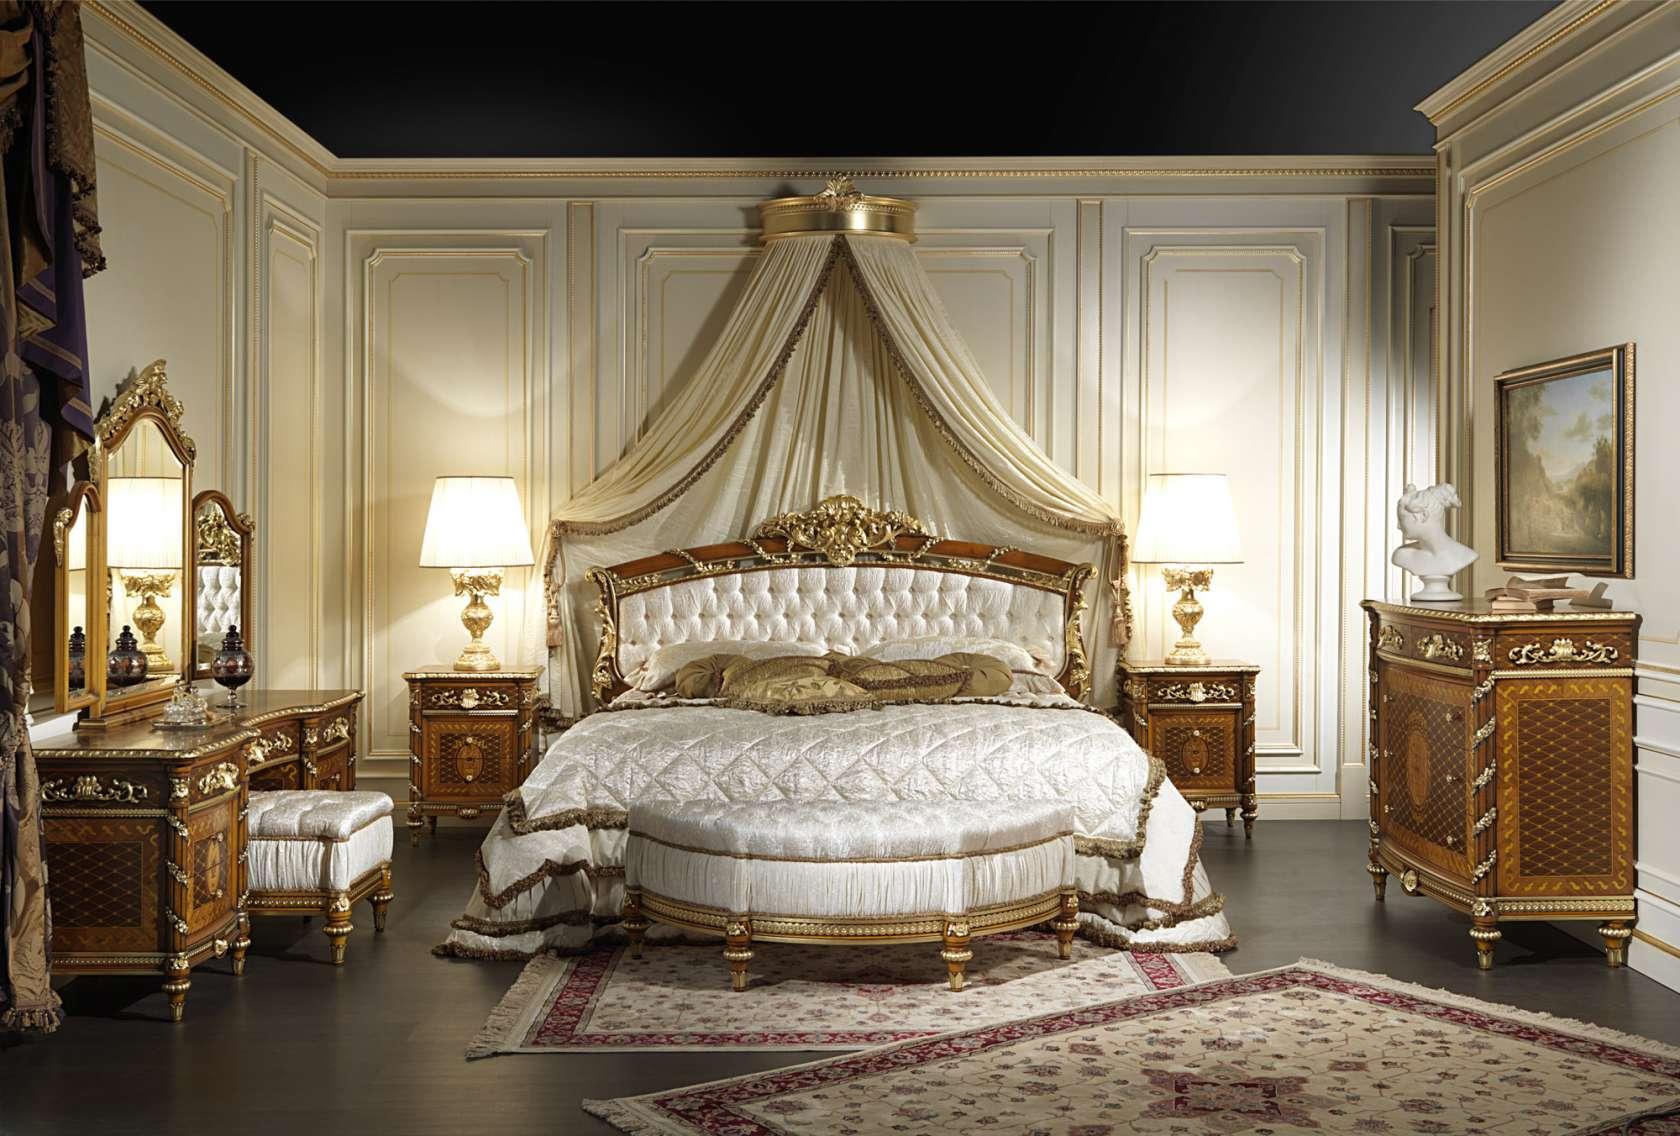 Furniture for walnut bedroom art. 2011 | Vimercati Meda